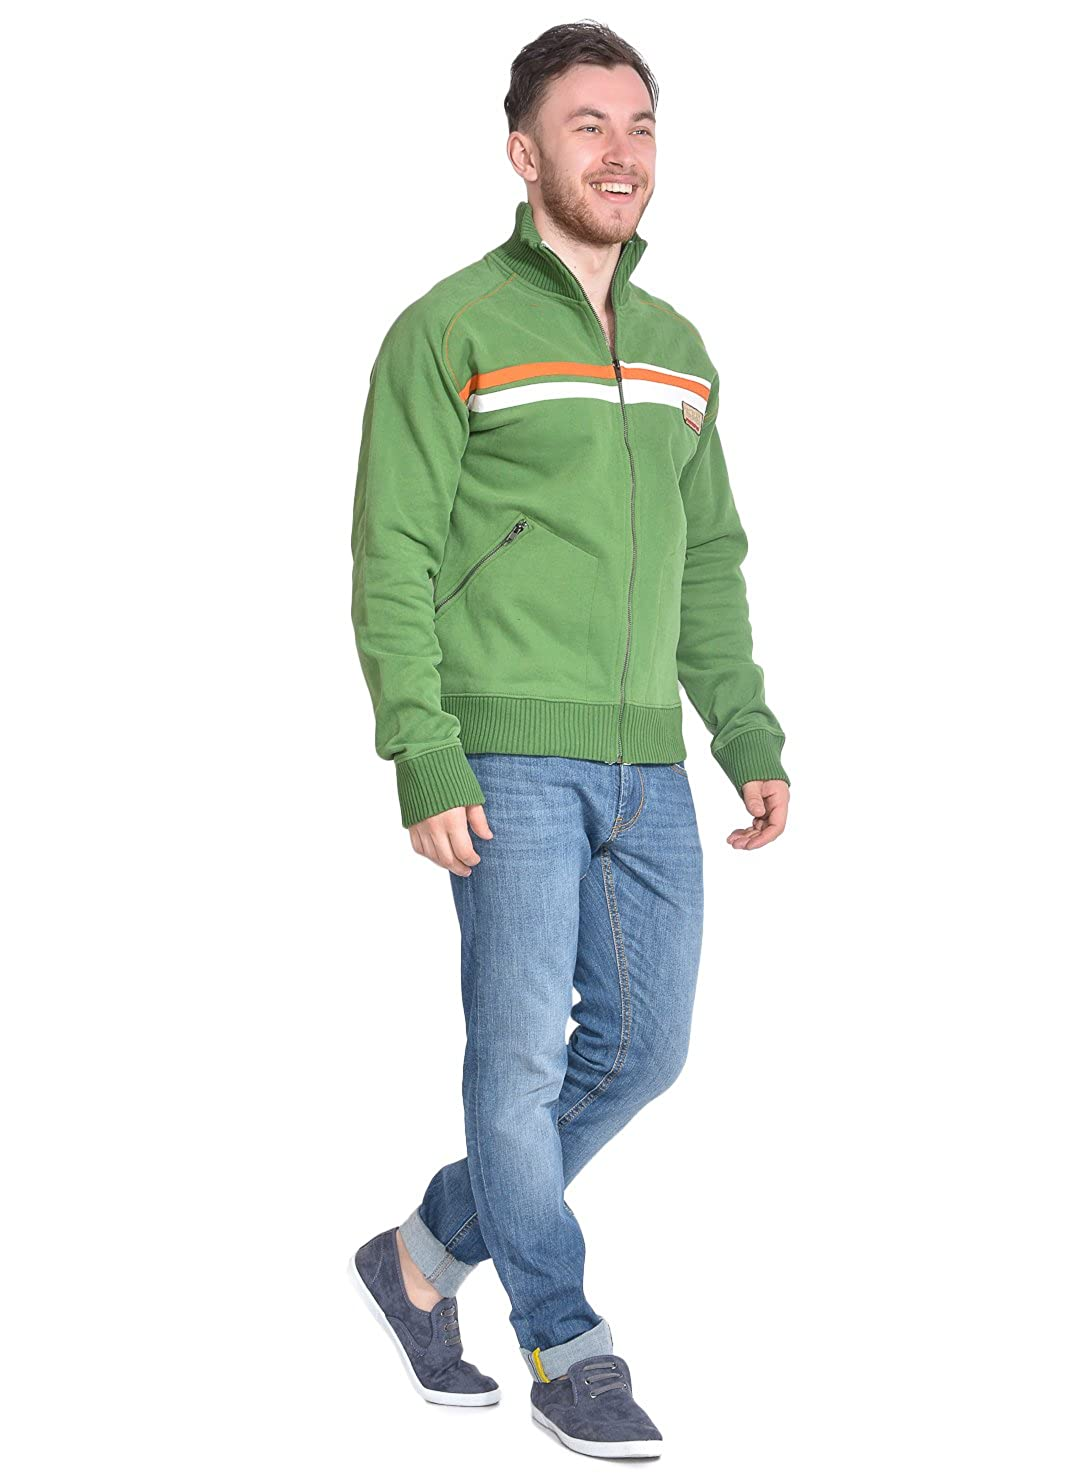 Homme Vert Green Manches Longues Von Dutch Sweat-Shirt